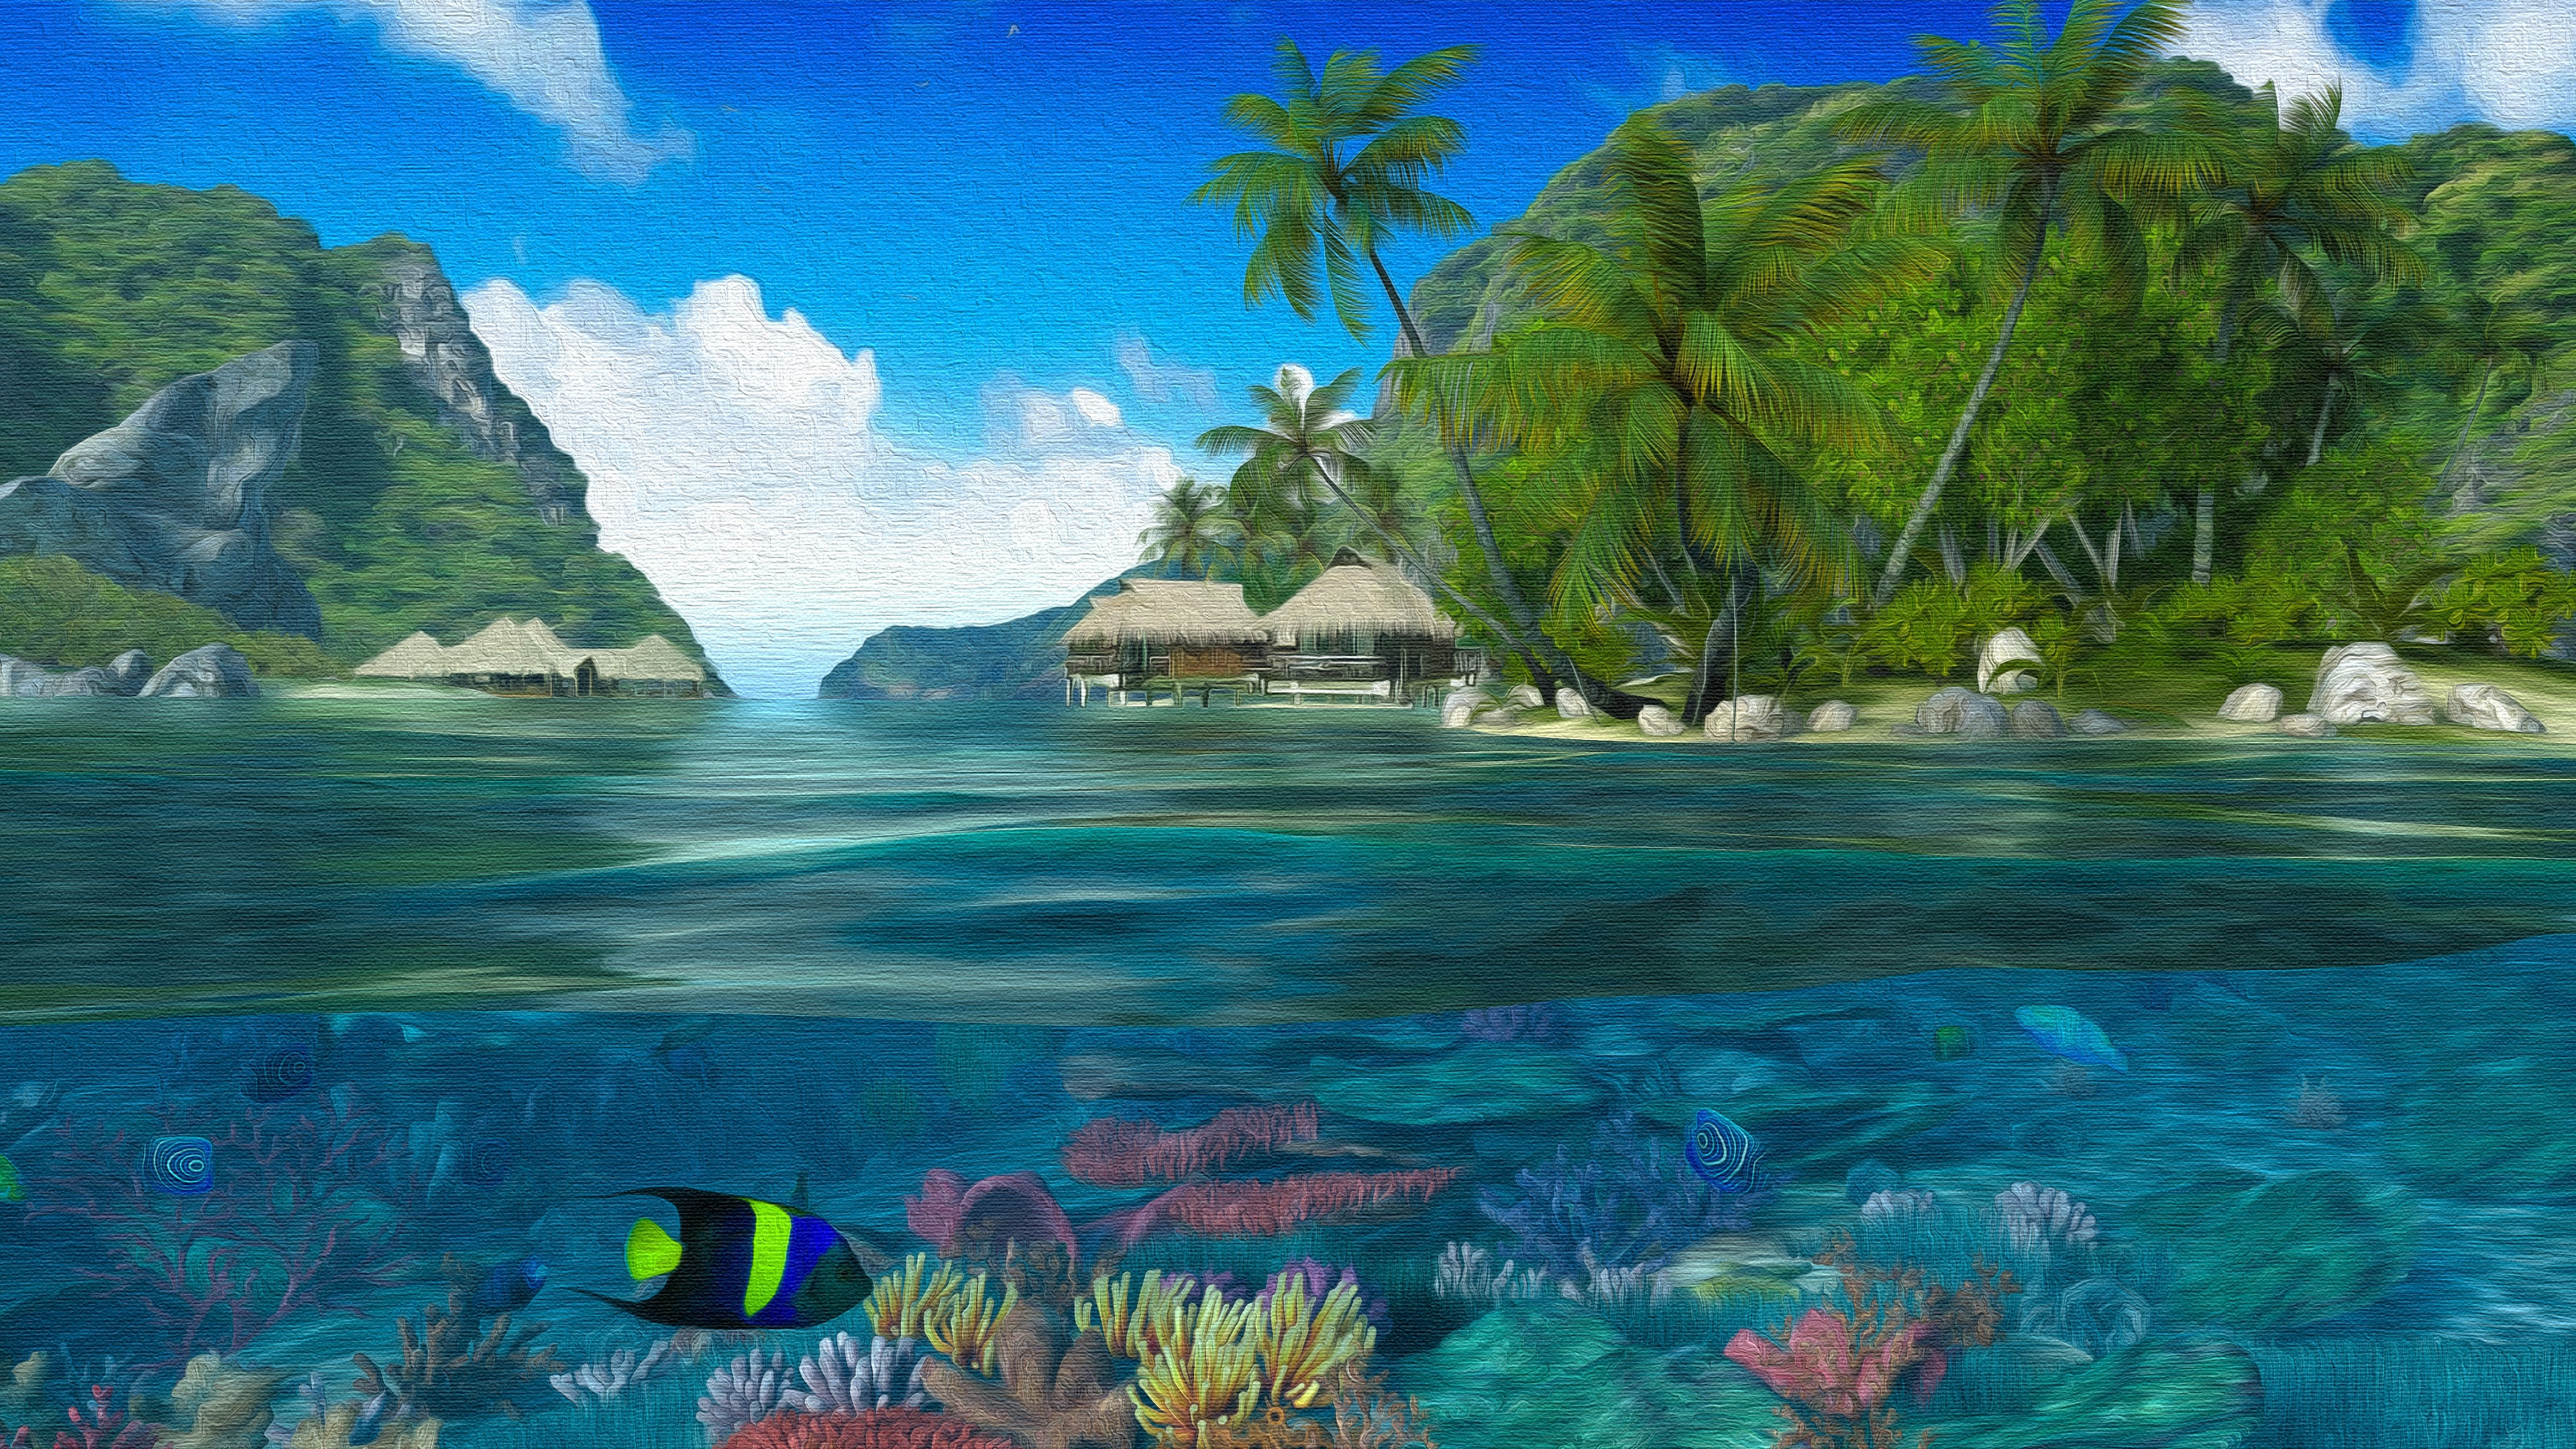 Fantasy tropical landscape painting art wallpaper